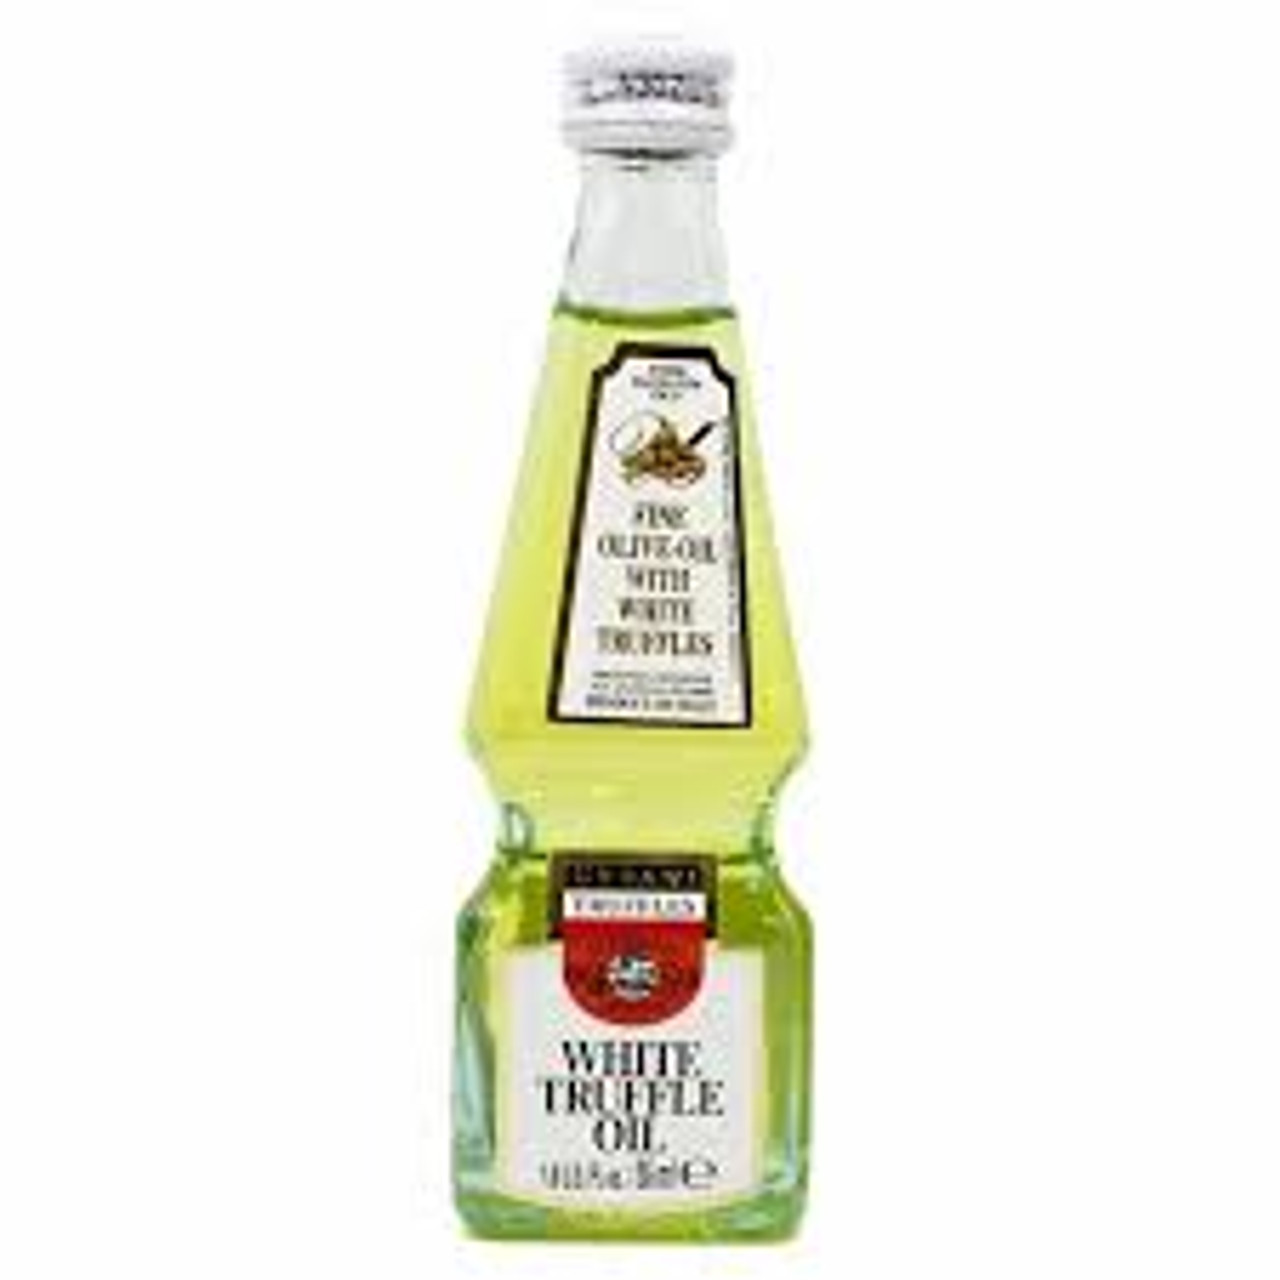 Urbani Extra Virgin Olive Oil with White Truffle